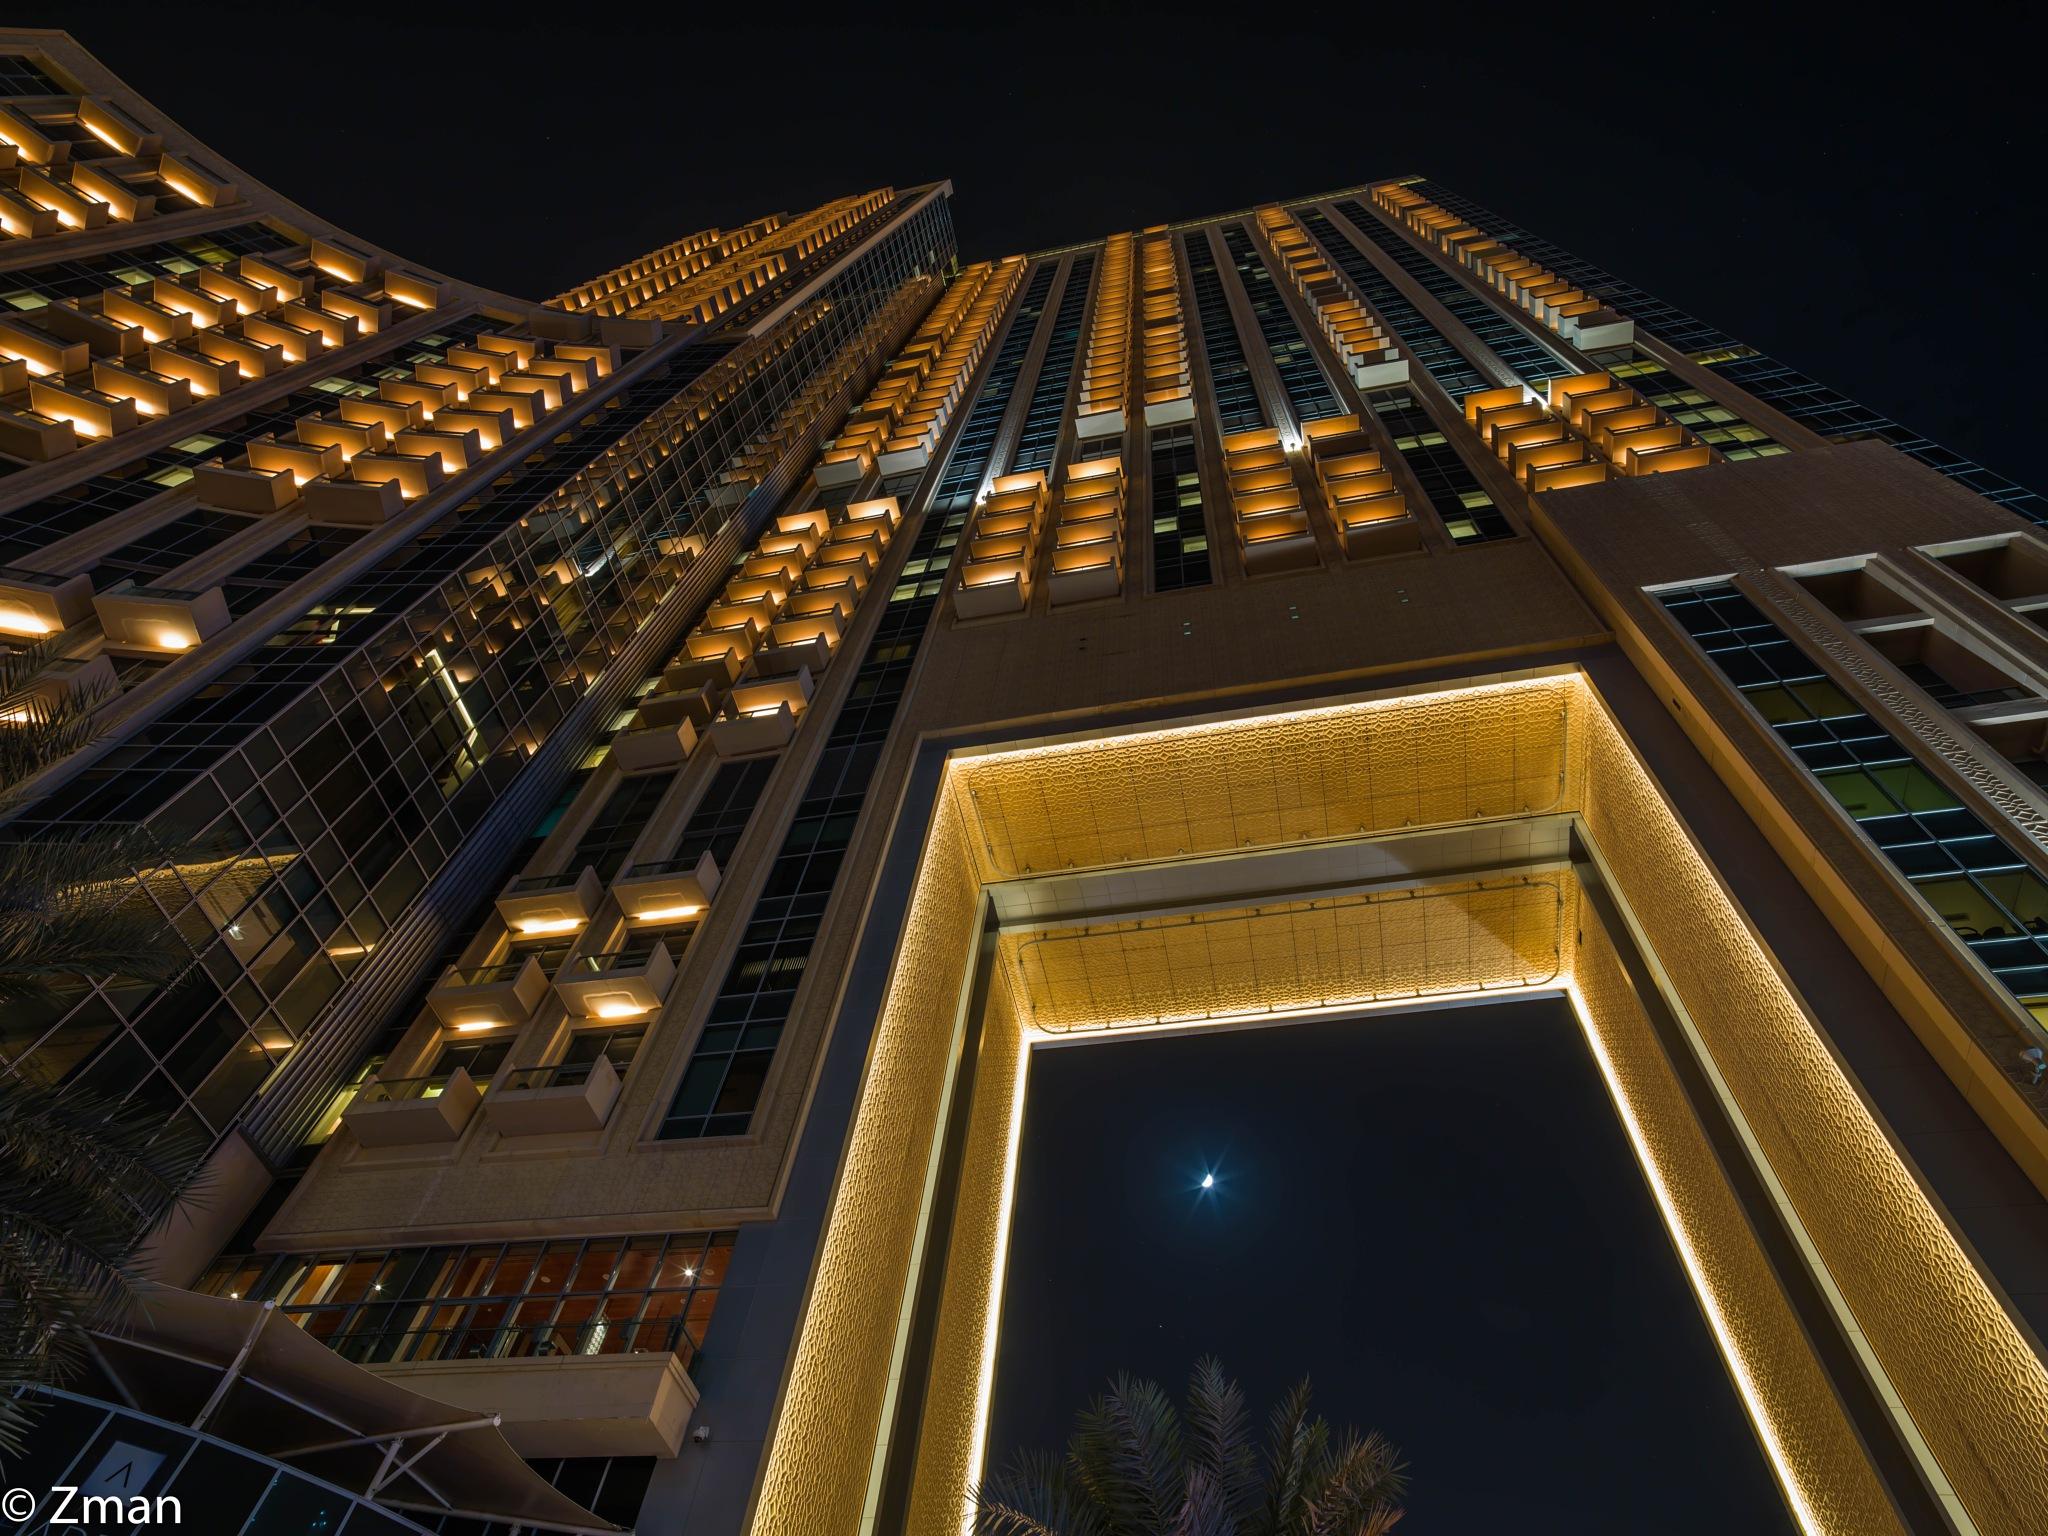 The Marina Hotel by muhammad.nasser.963